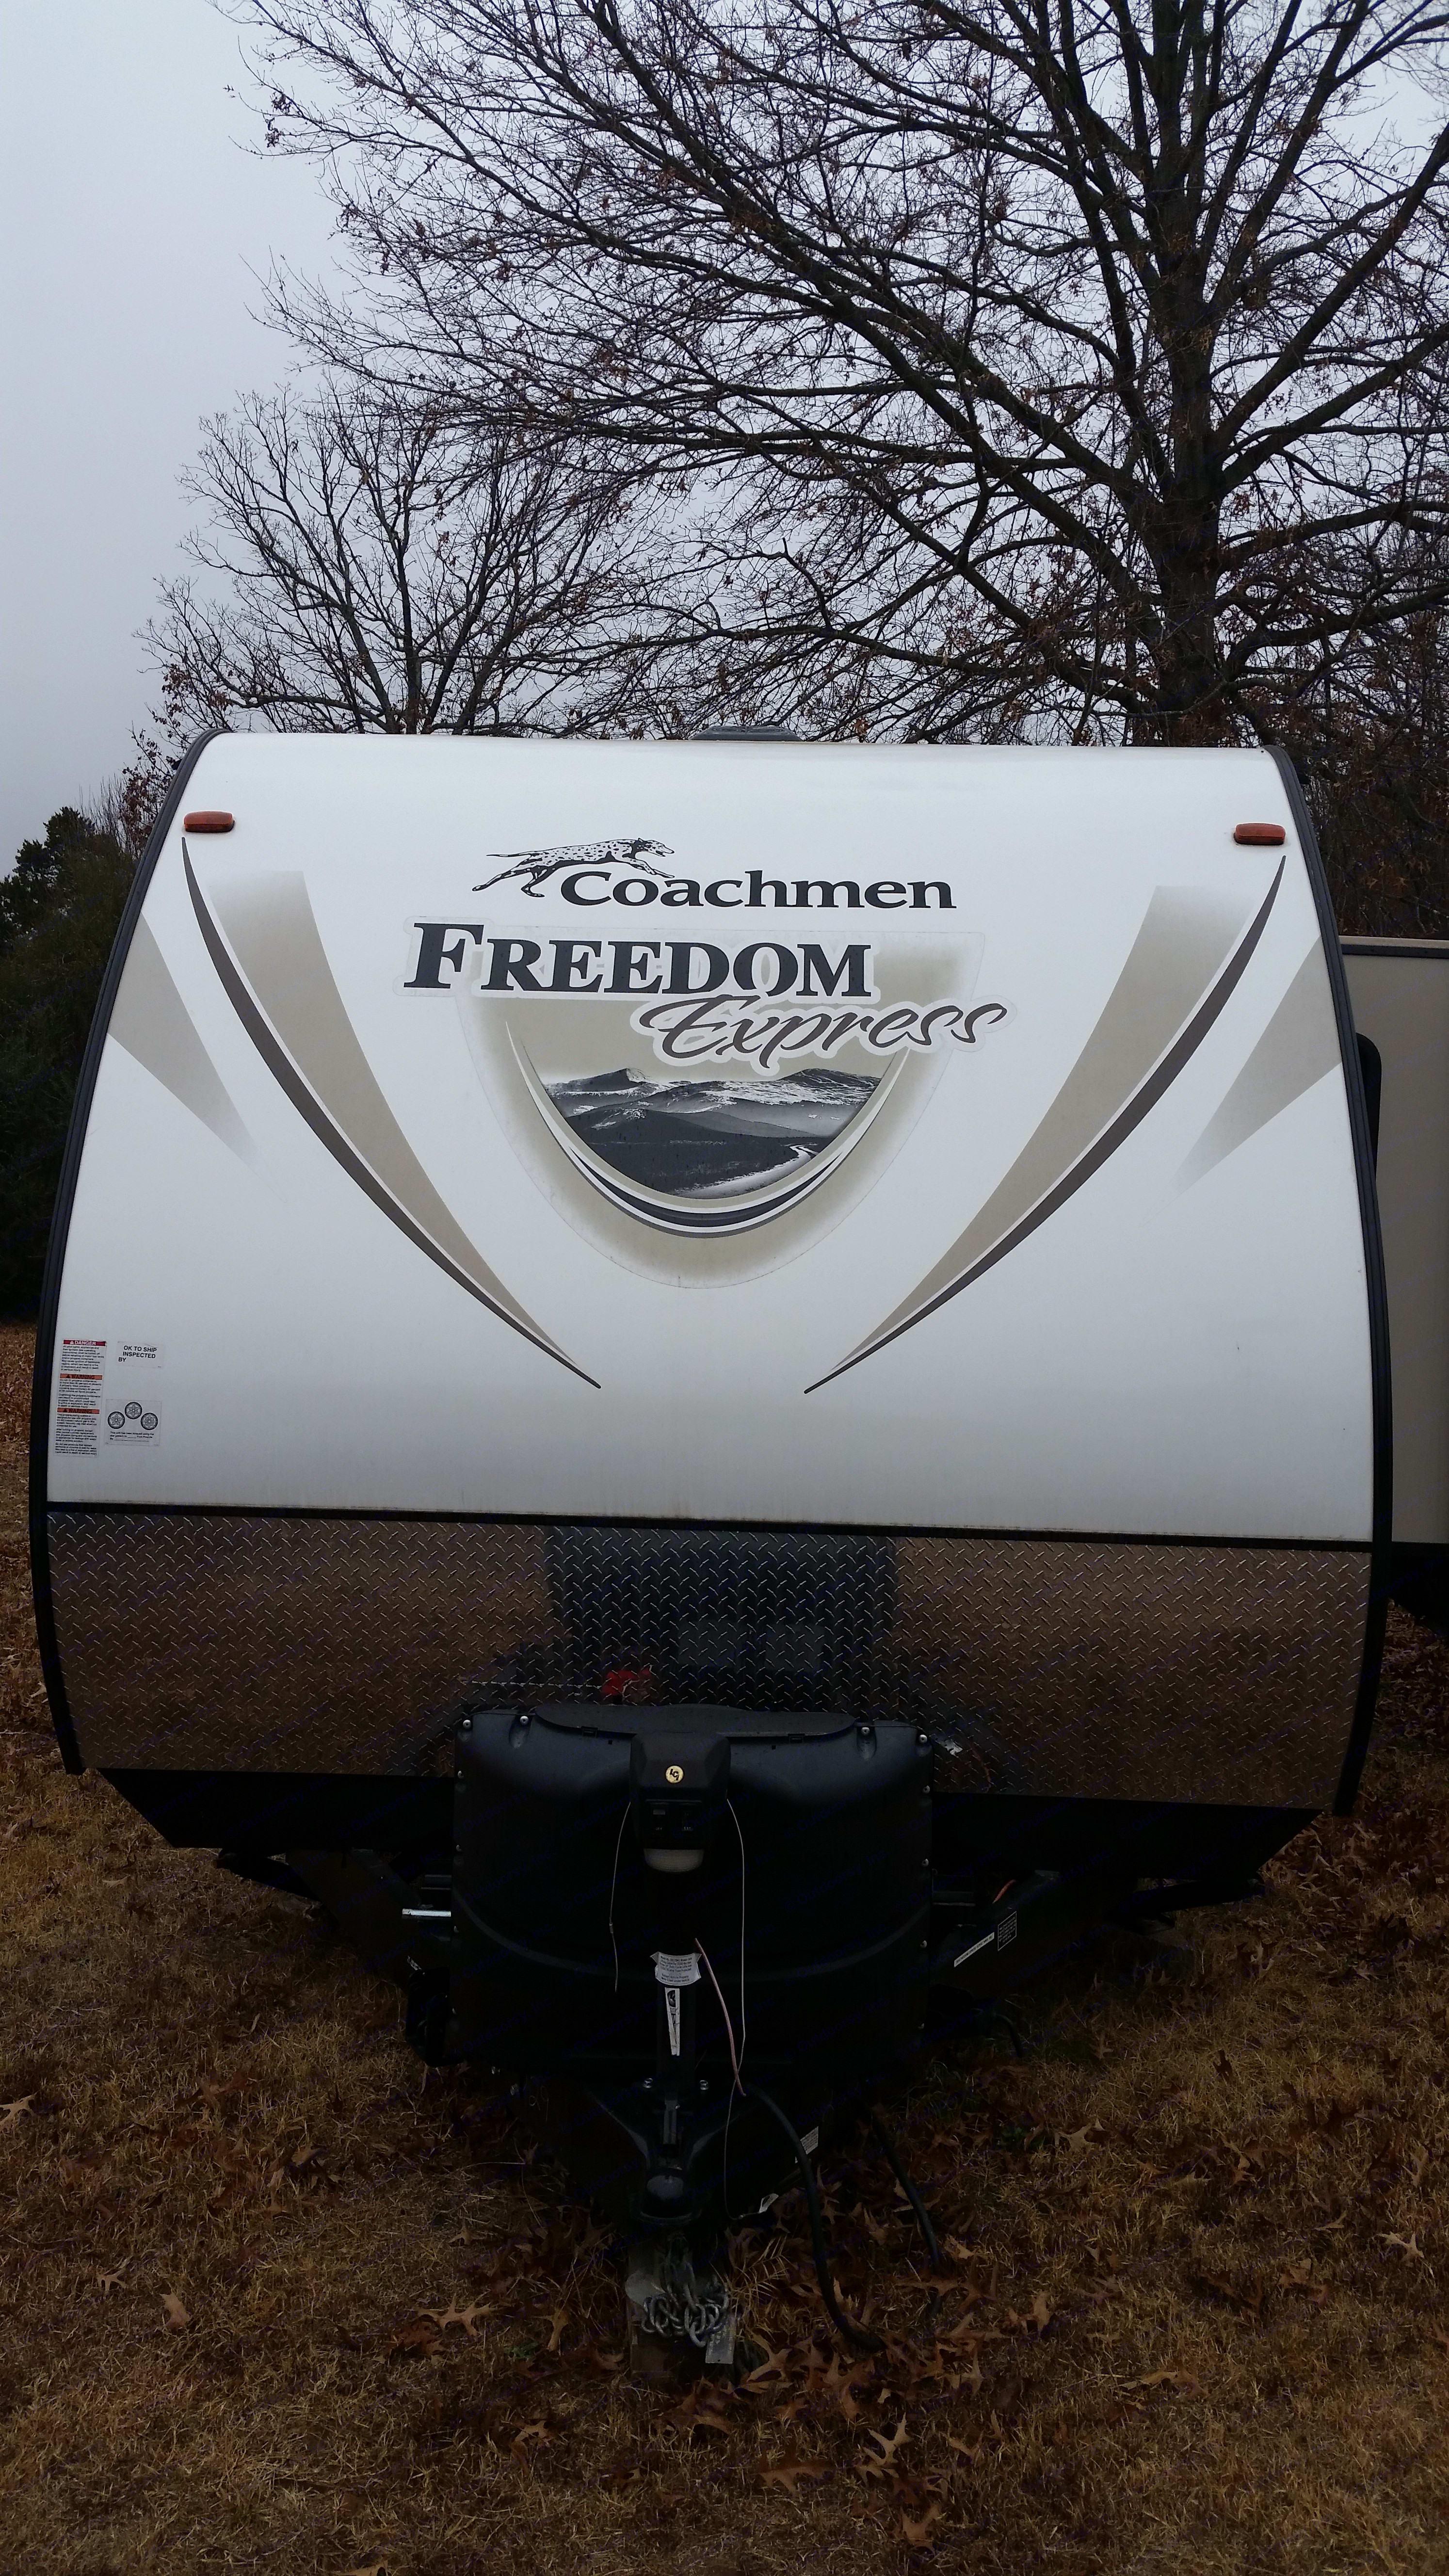 Coachmen Freedom Express 2016